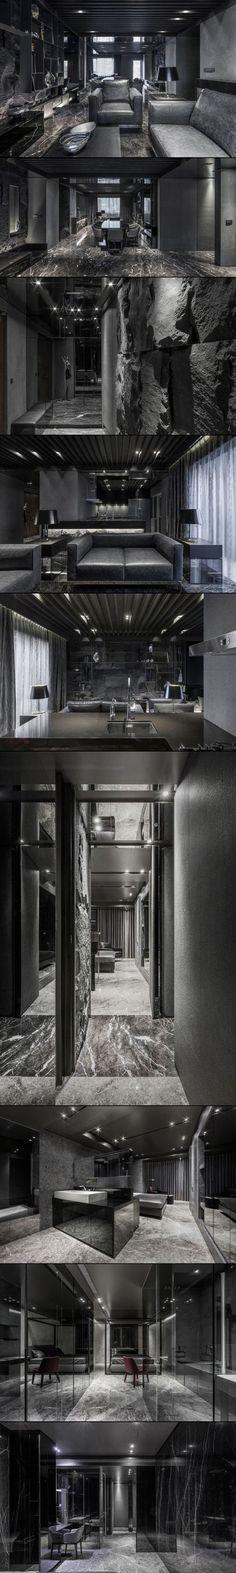 "Daring Monochromatic Interior Scheme: ""Home in Black Serenity"" in Taipei"